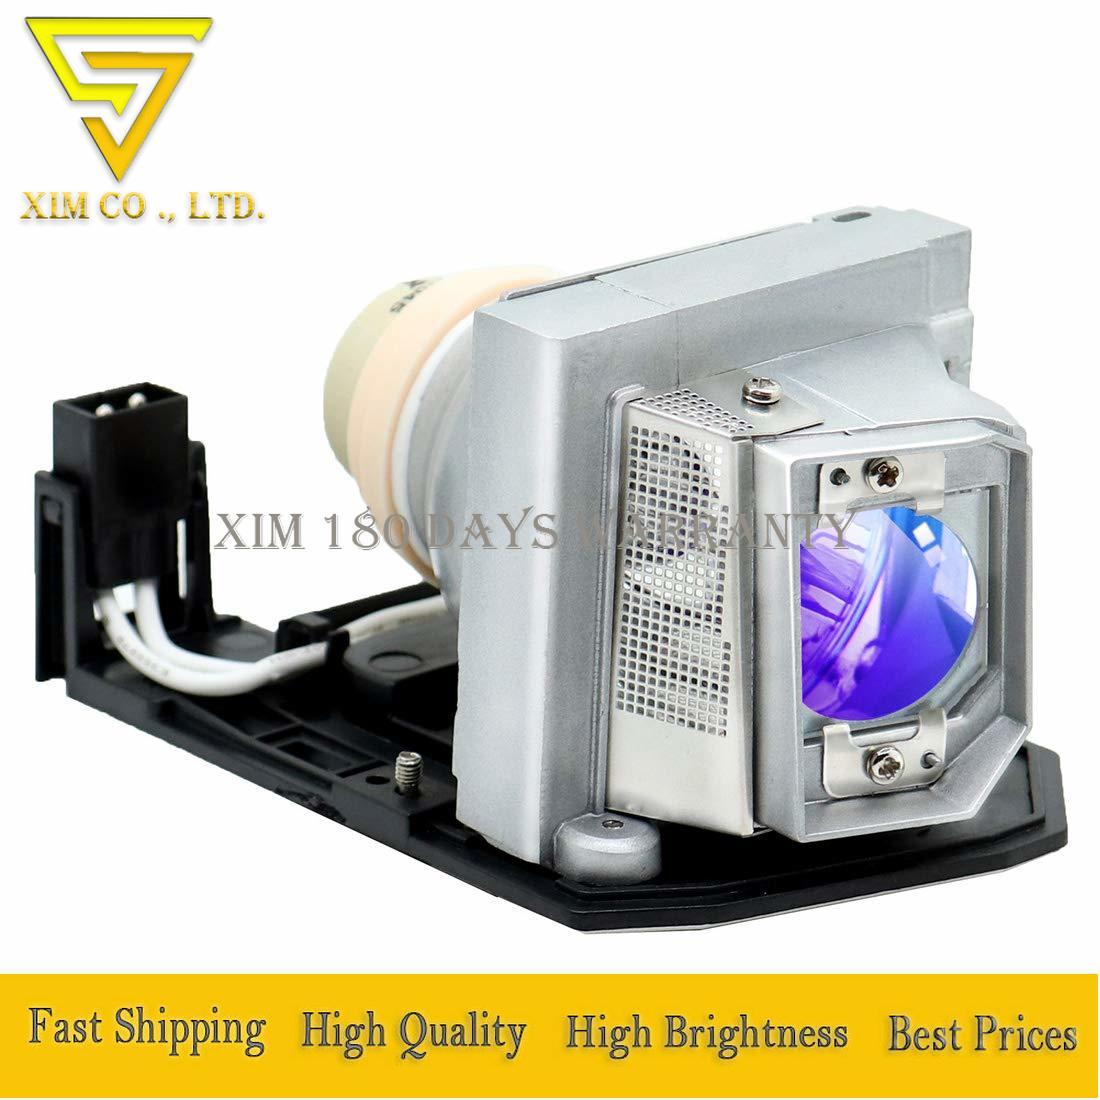 Premium Quality BL-FU190E / SP.8VC01GC01 Replacement Projector Lamp For Optoma HD25e HD131Xe HD131Xw EC300ST VDHDNUE